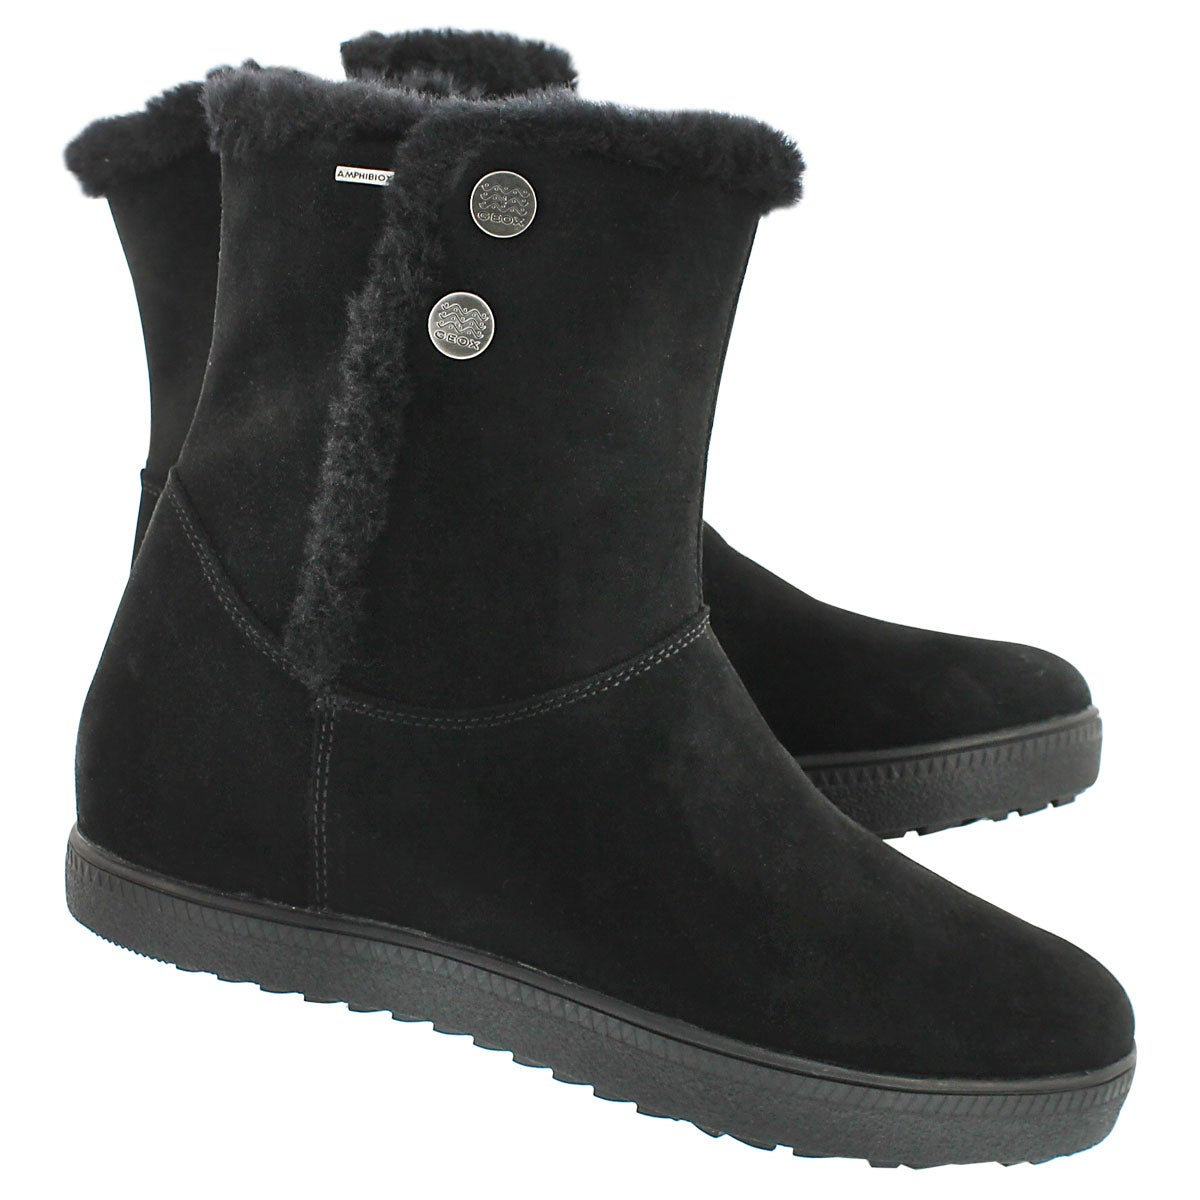 Lds Amarantha High black lined boot